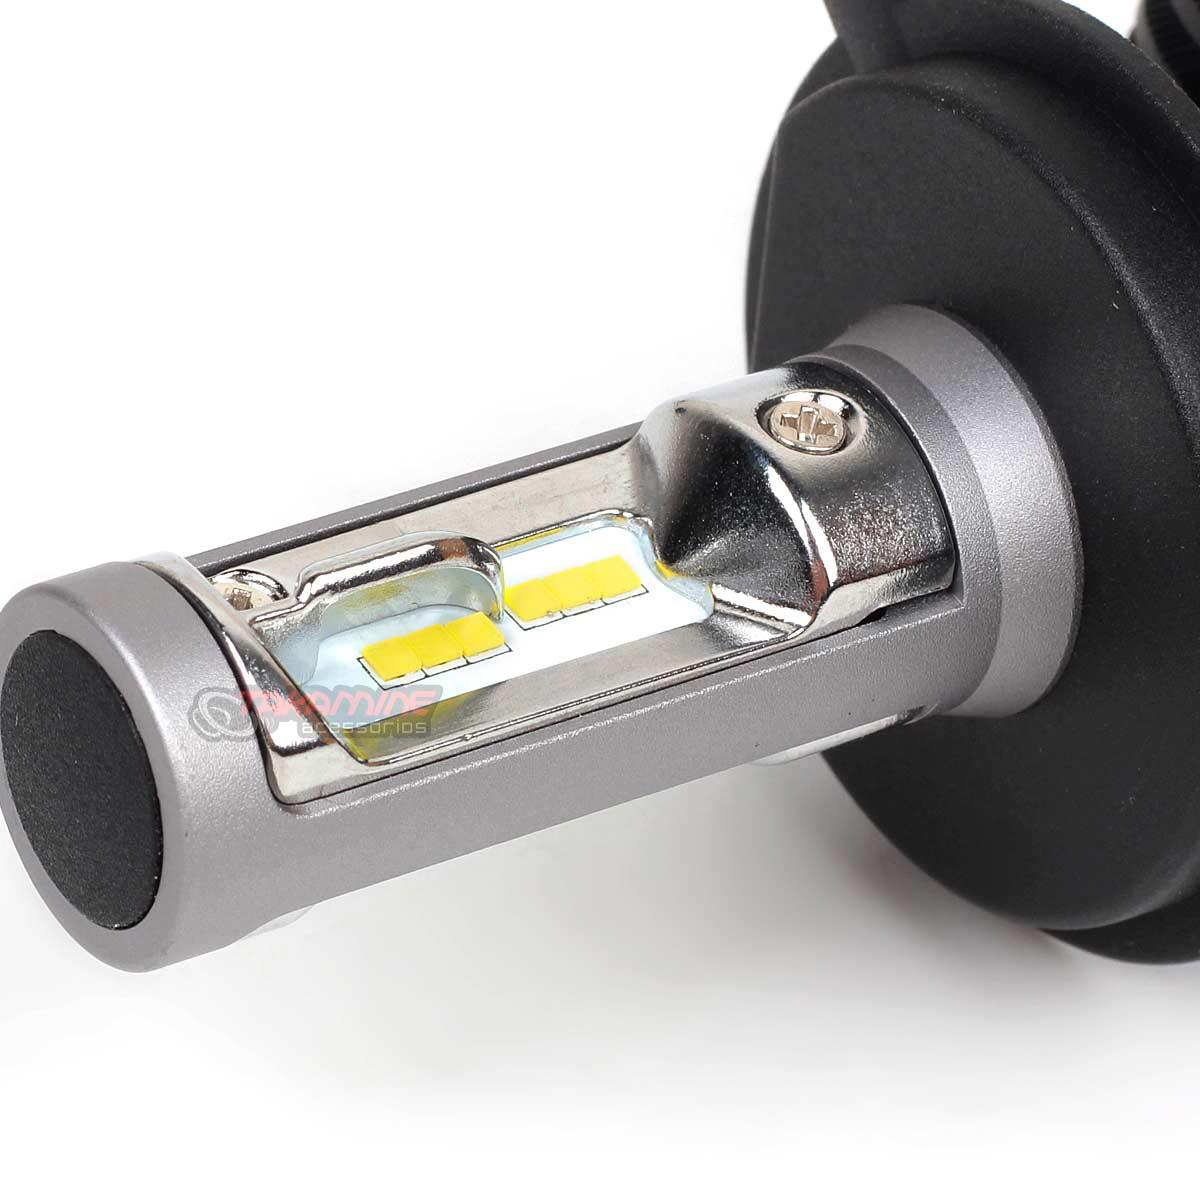 Kit Ultra LED Gol G3 2000 2001 2002 2003 2004 2005 tipo xenon farol alto e baixo H4 50W